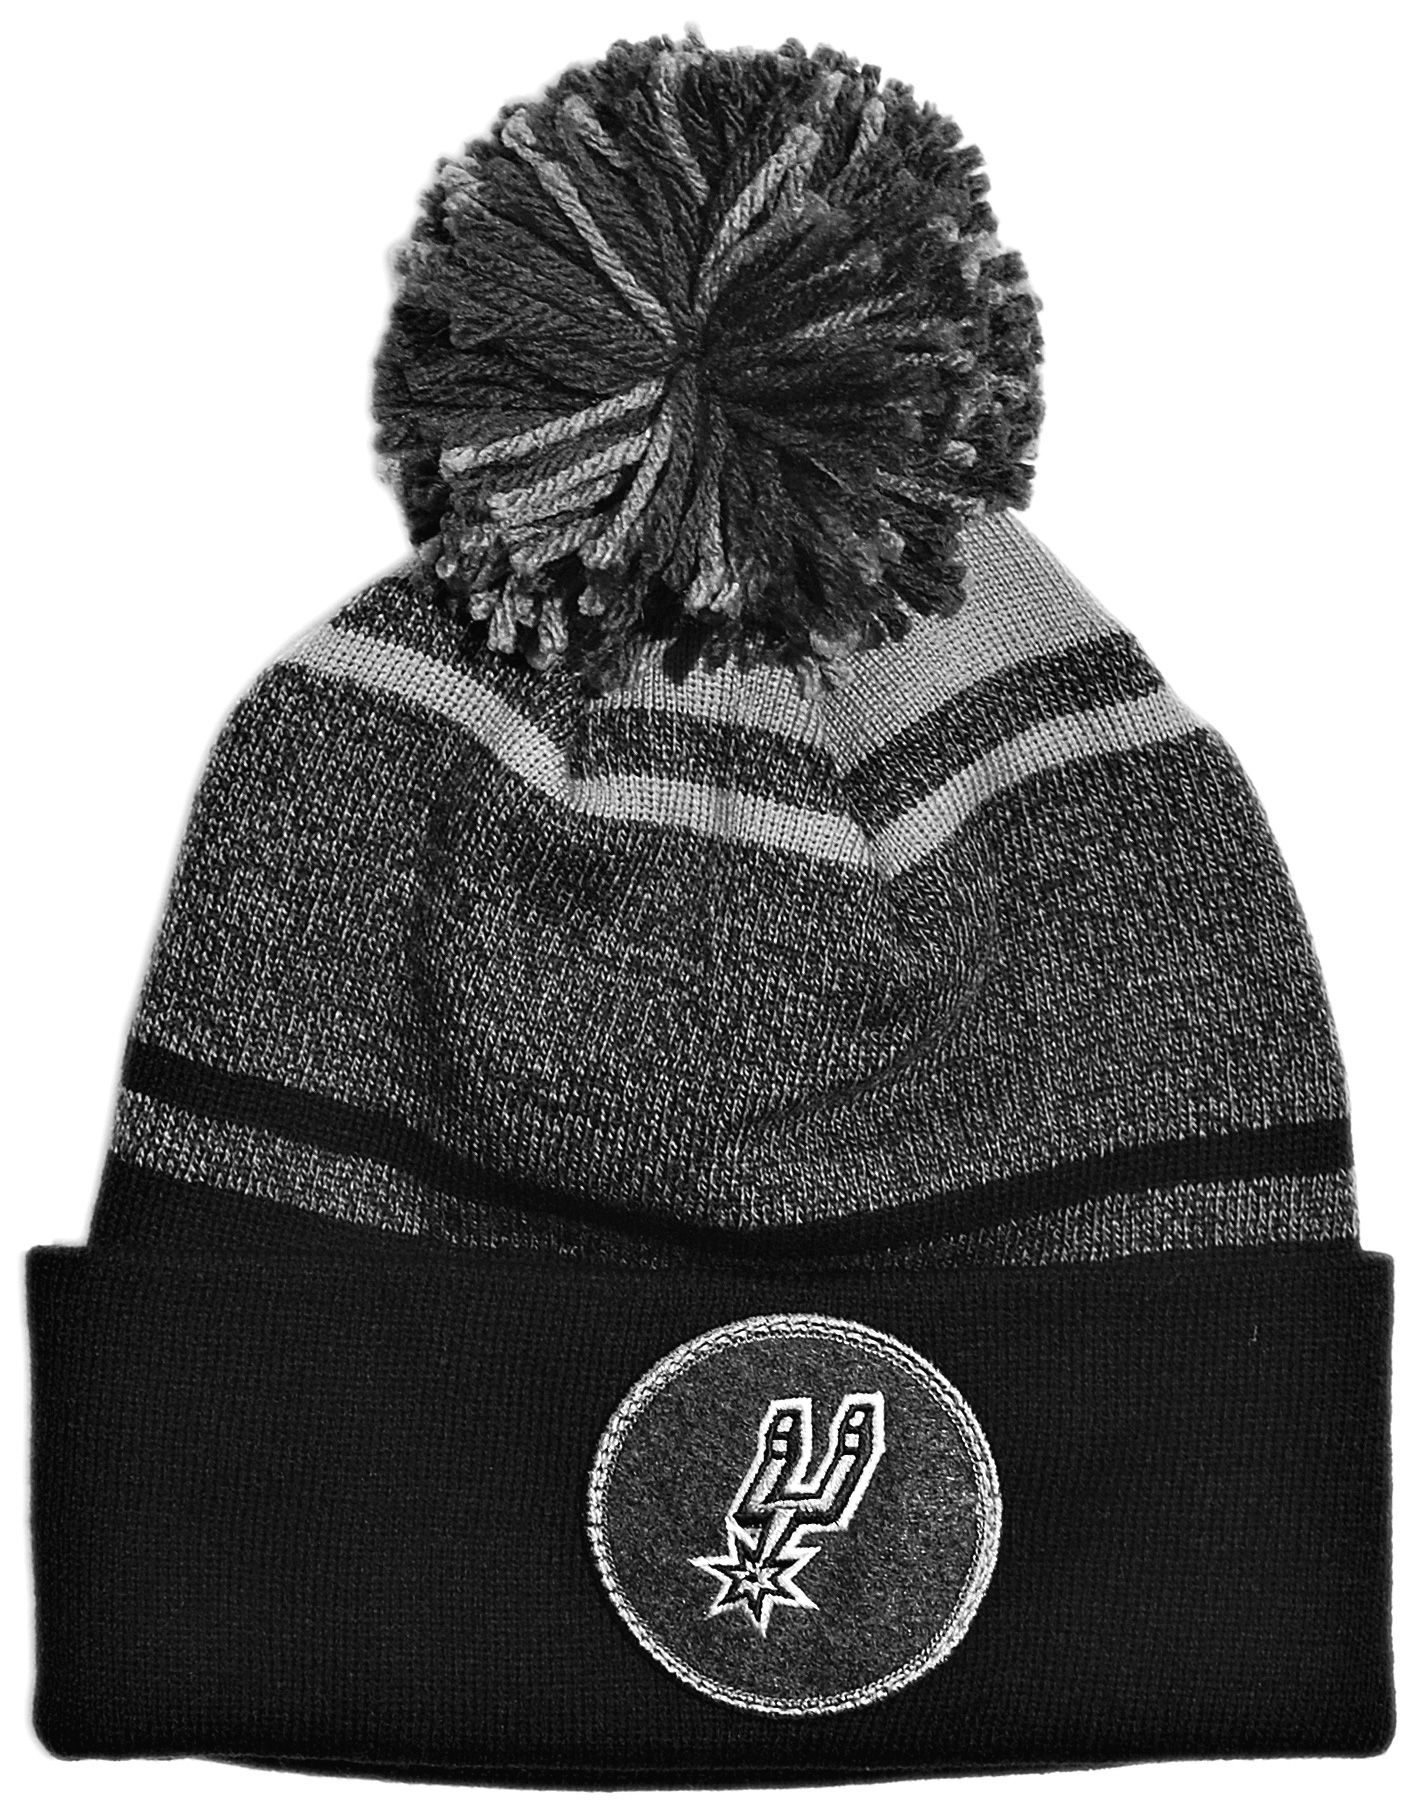 5a6c8400e2a Mitchell   Ness x NBA -  San Antonio Spurs - NBA Current Logo Heather  Stripe Cuffed Knit Pom  (Winter Beanie Hat)